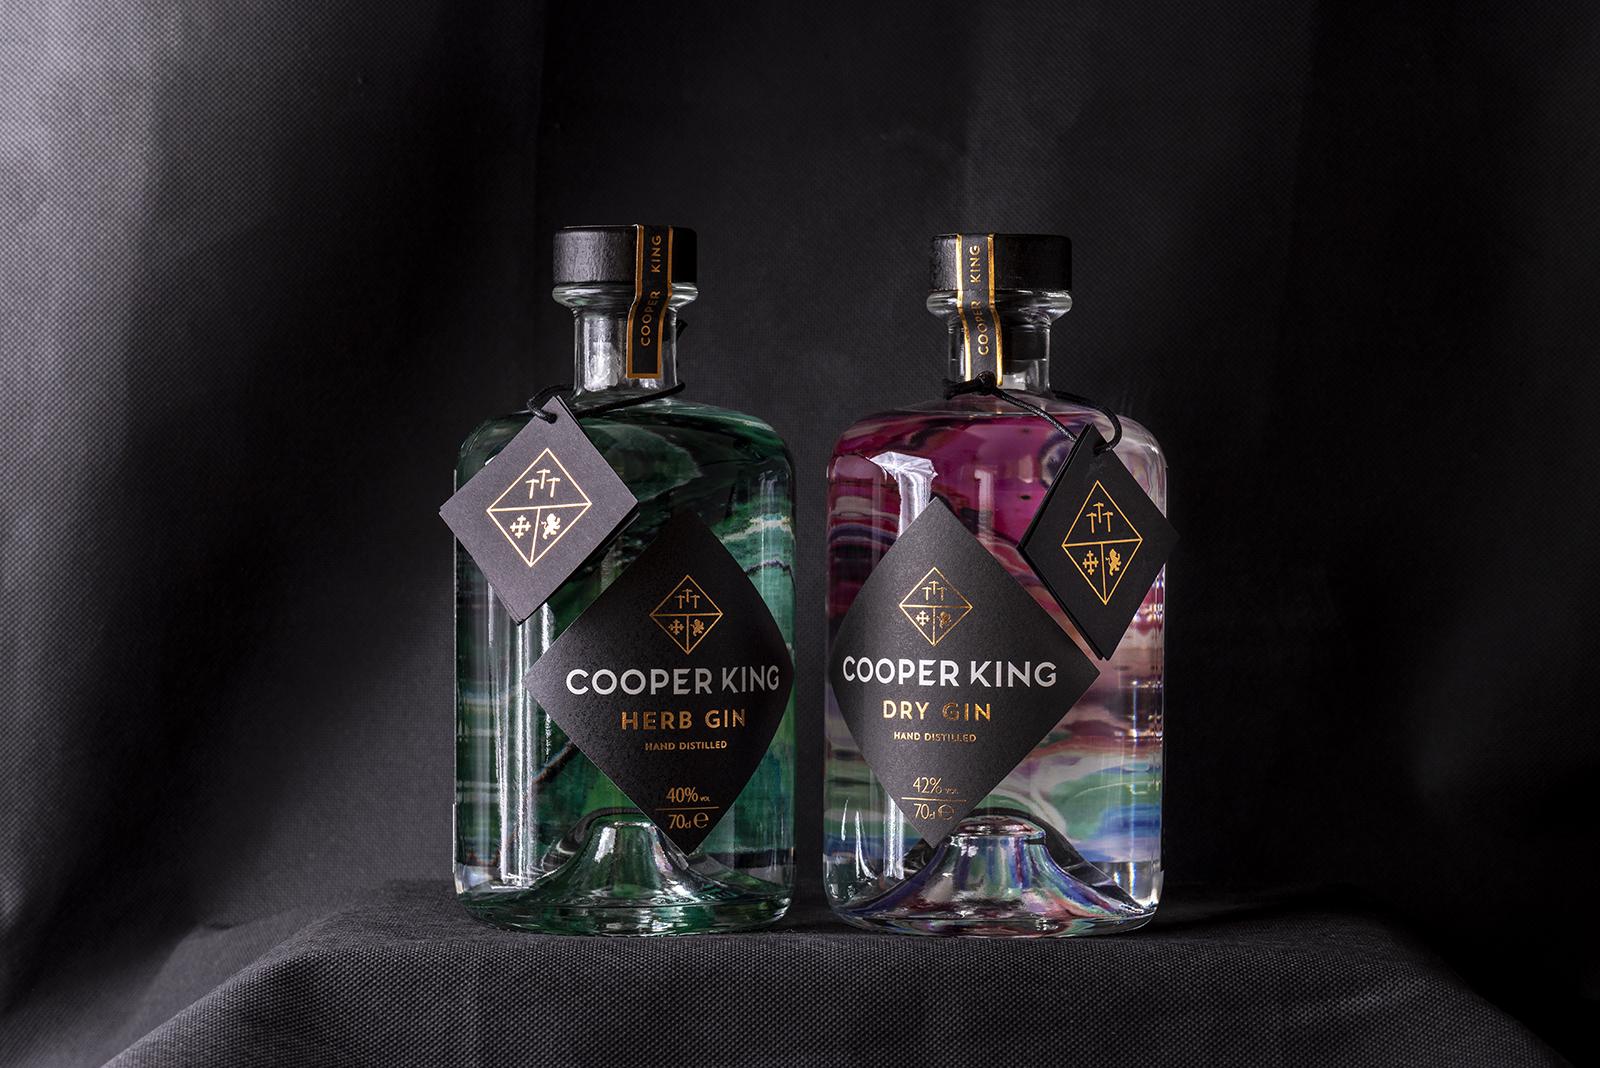 Cooper King Distillery gins